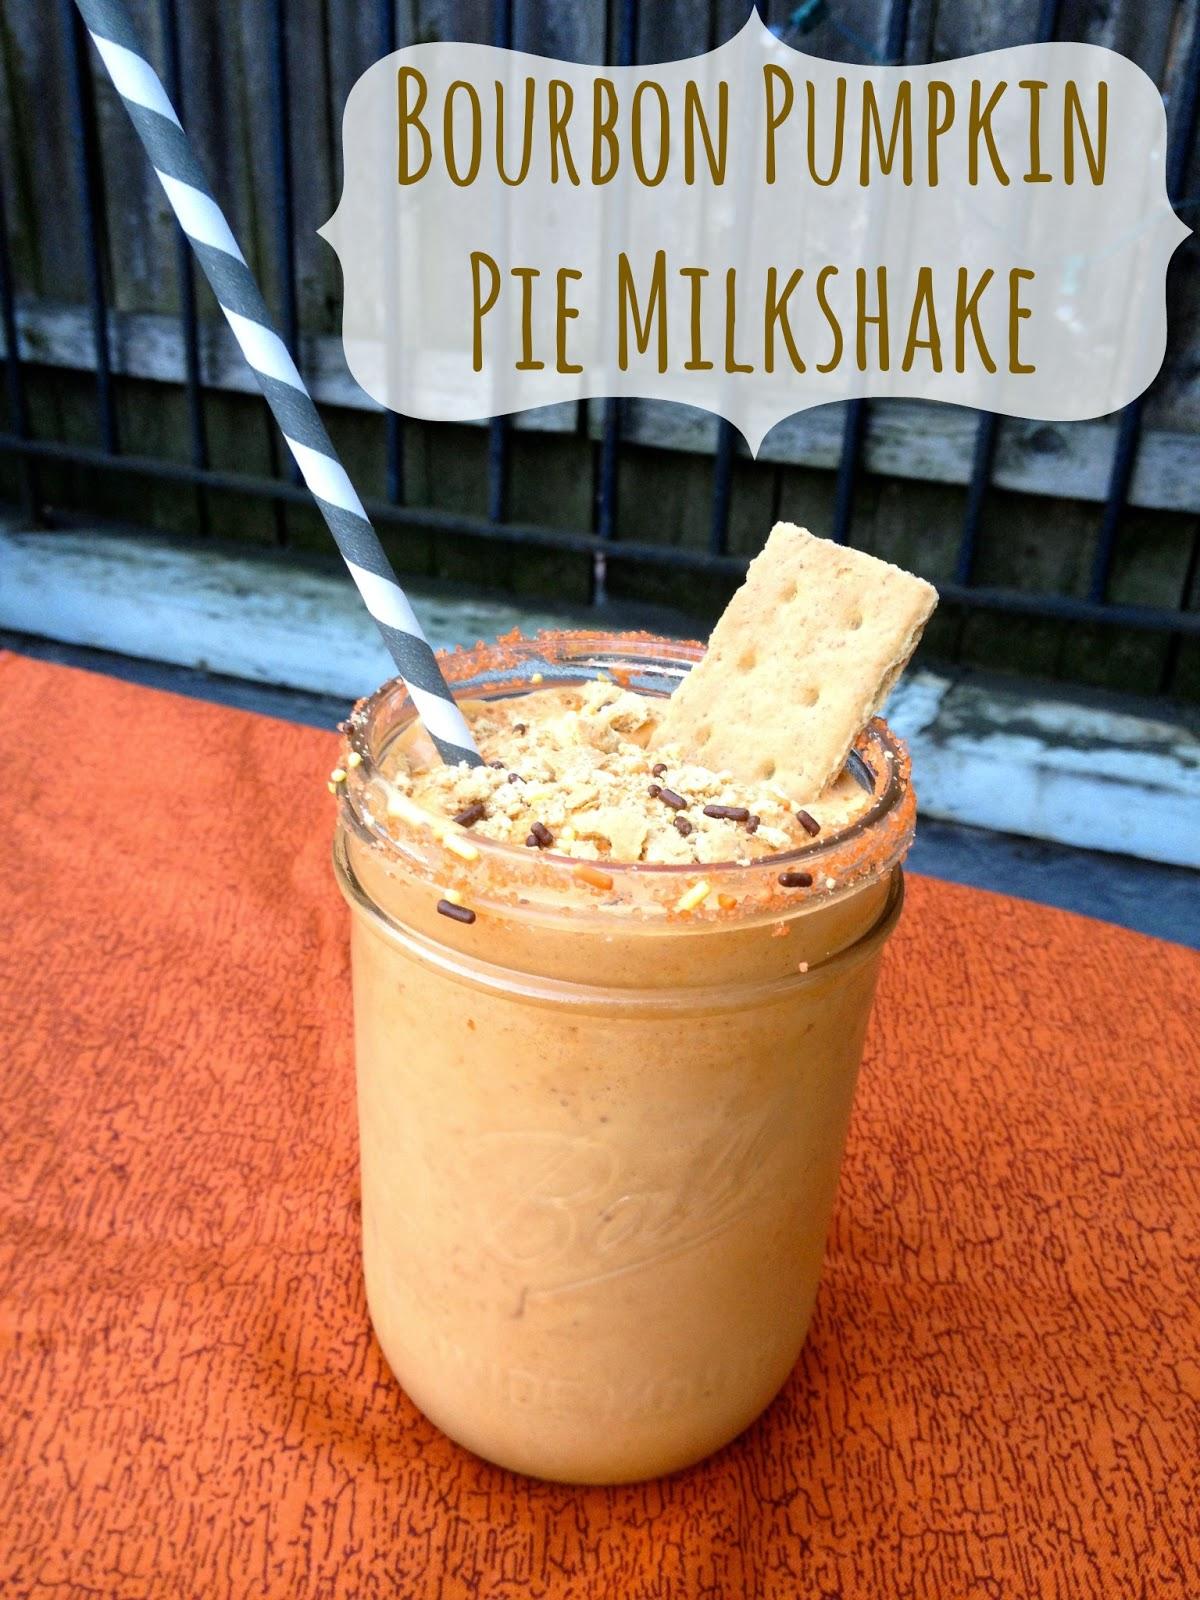 The Sequin Notebook: Top 5 Pumpkin Recipes + Starbucks GIVEAWAY!